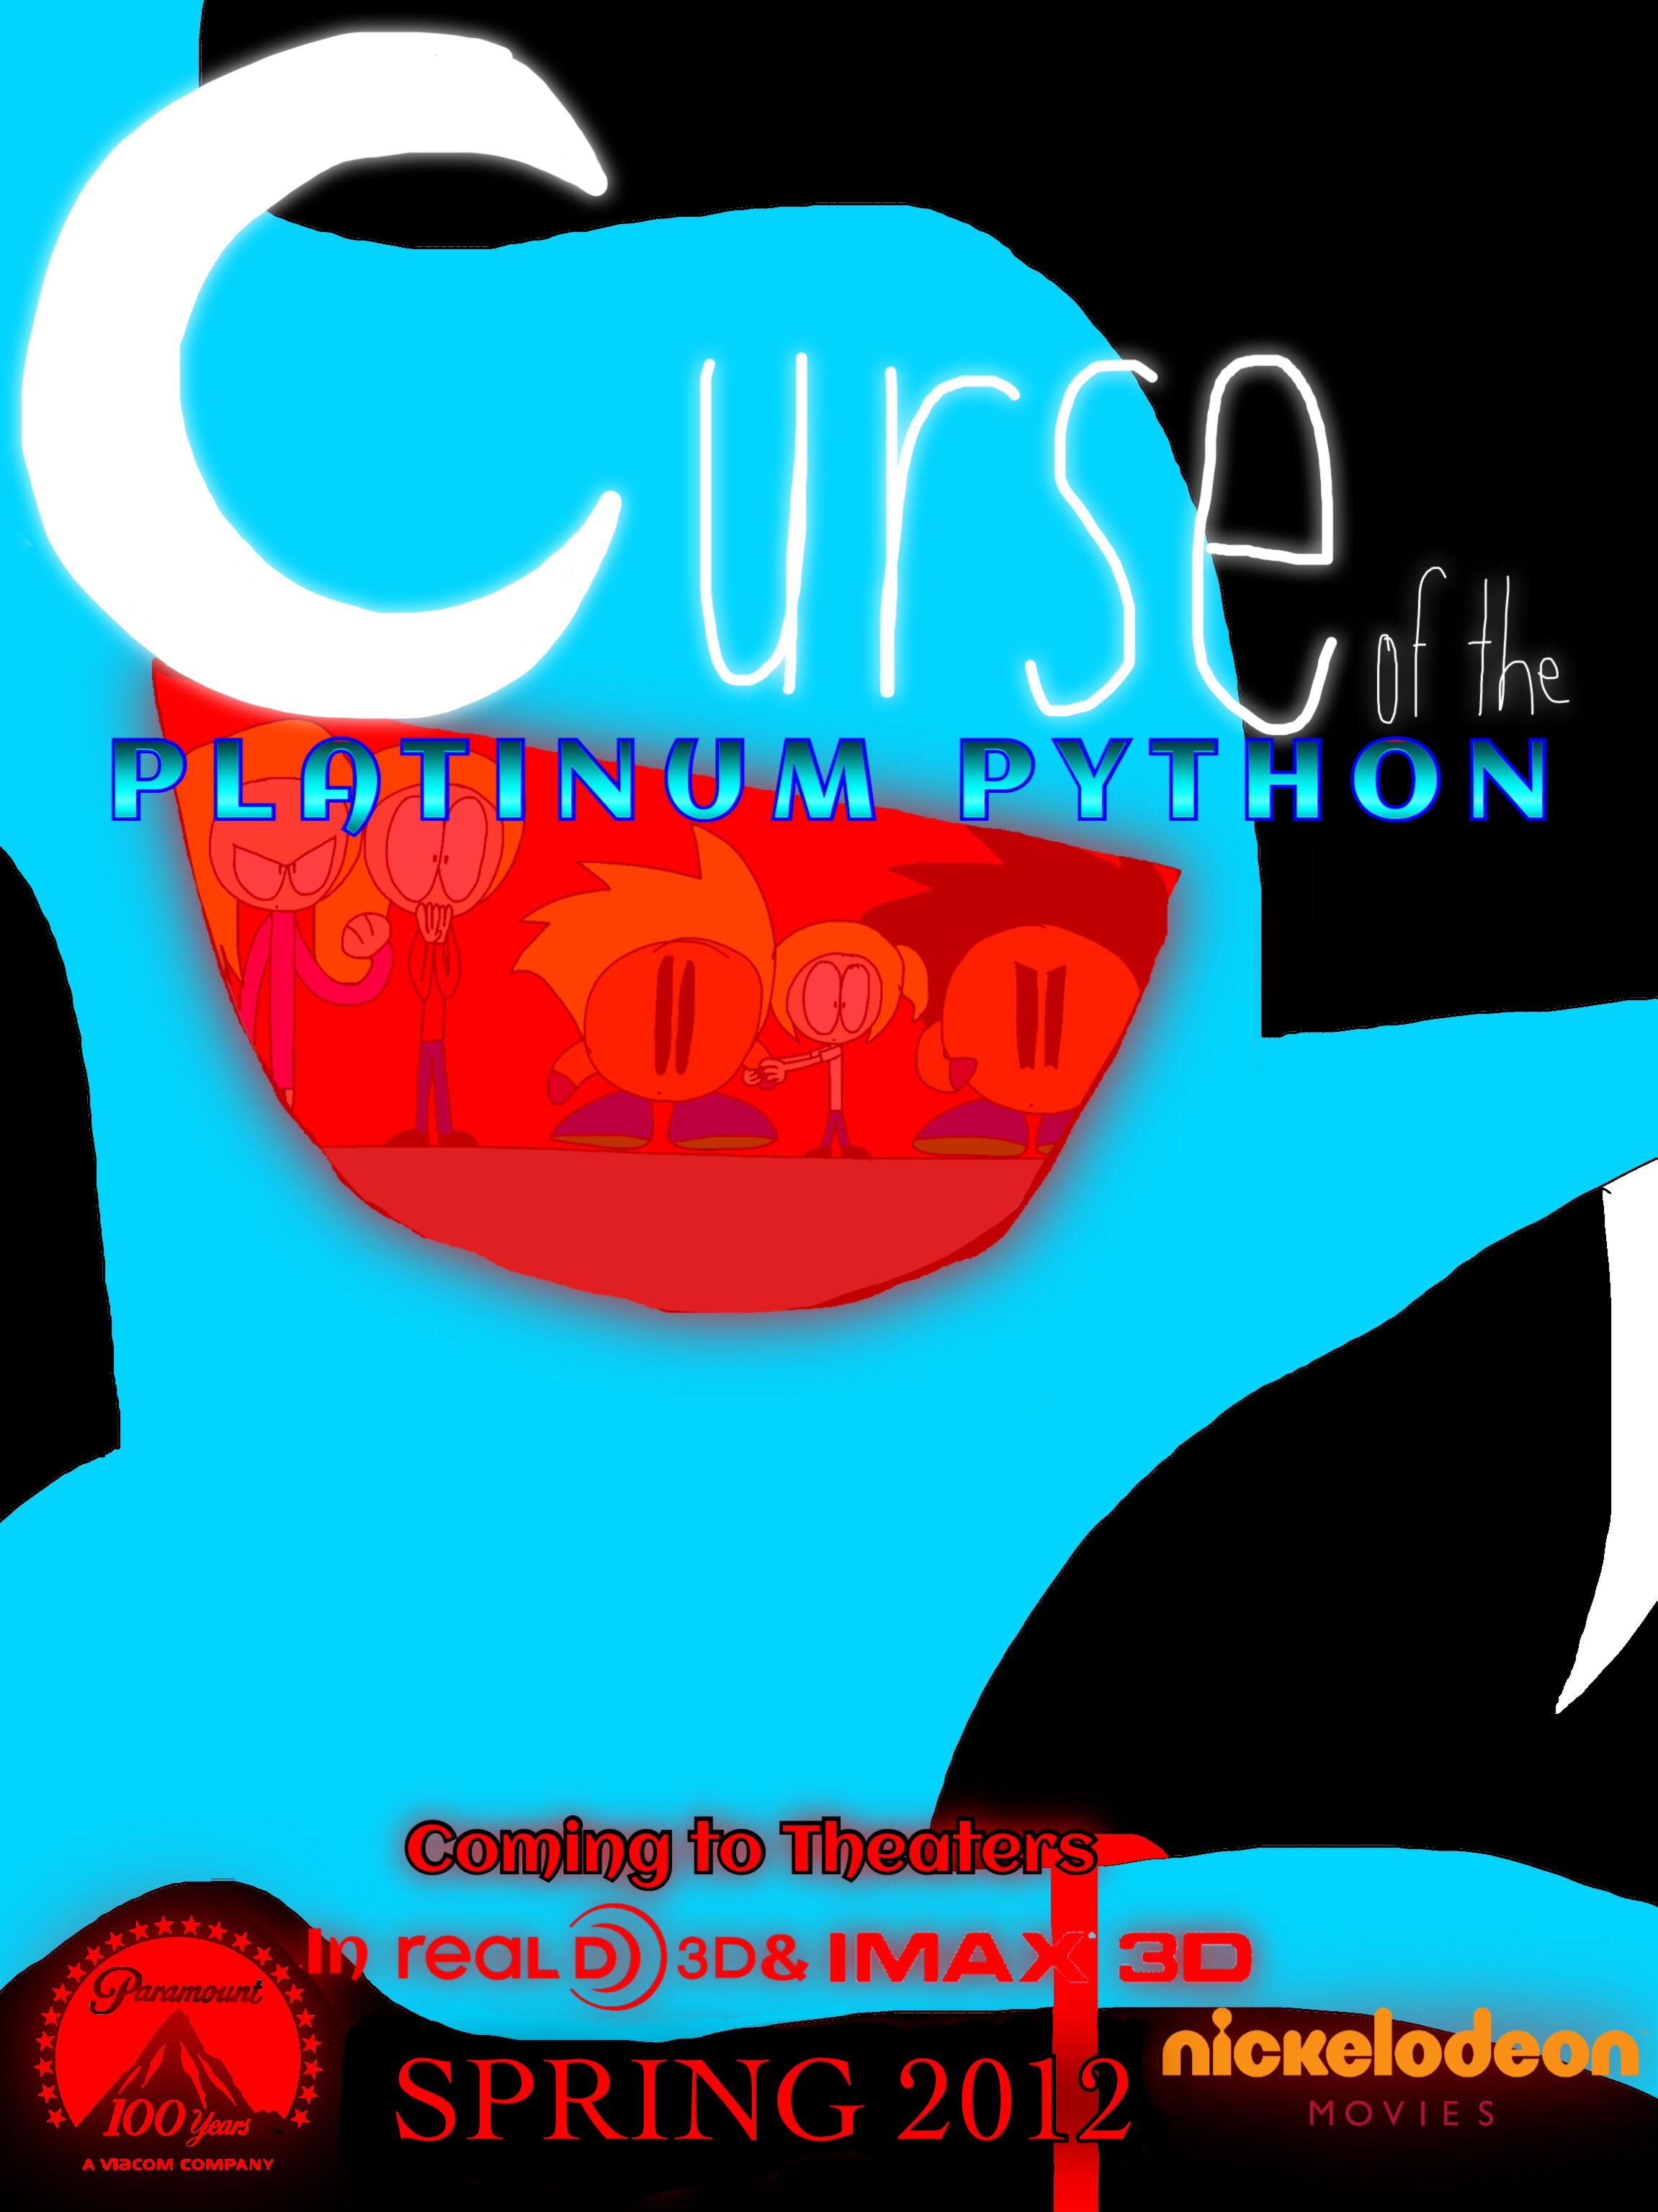 The Curse of the Platinum Python